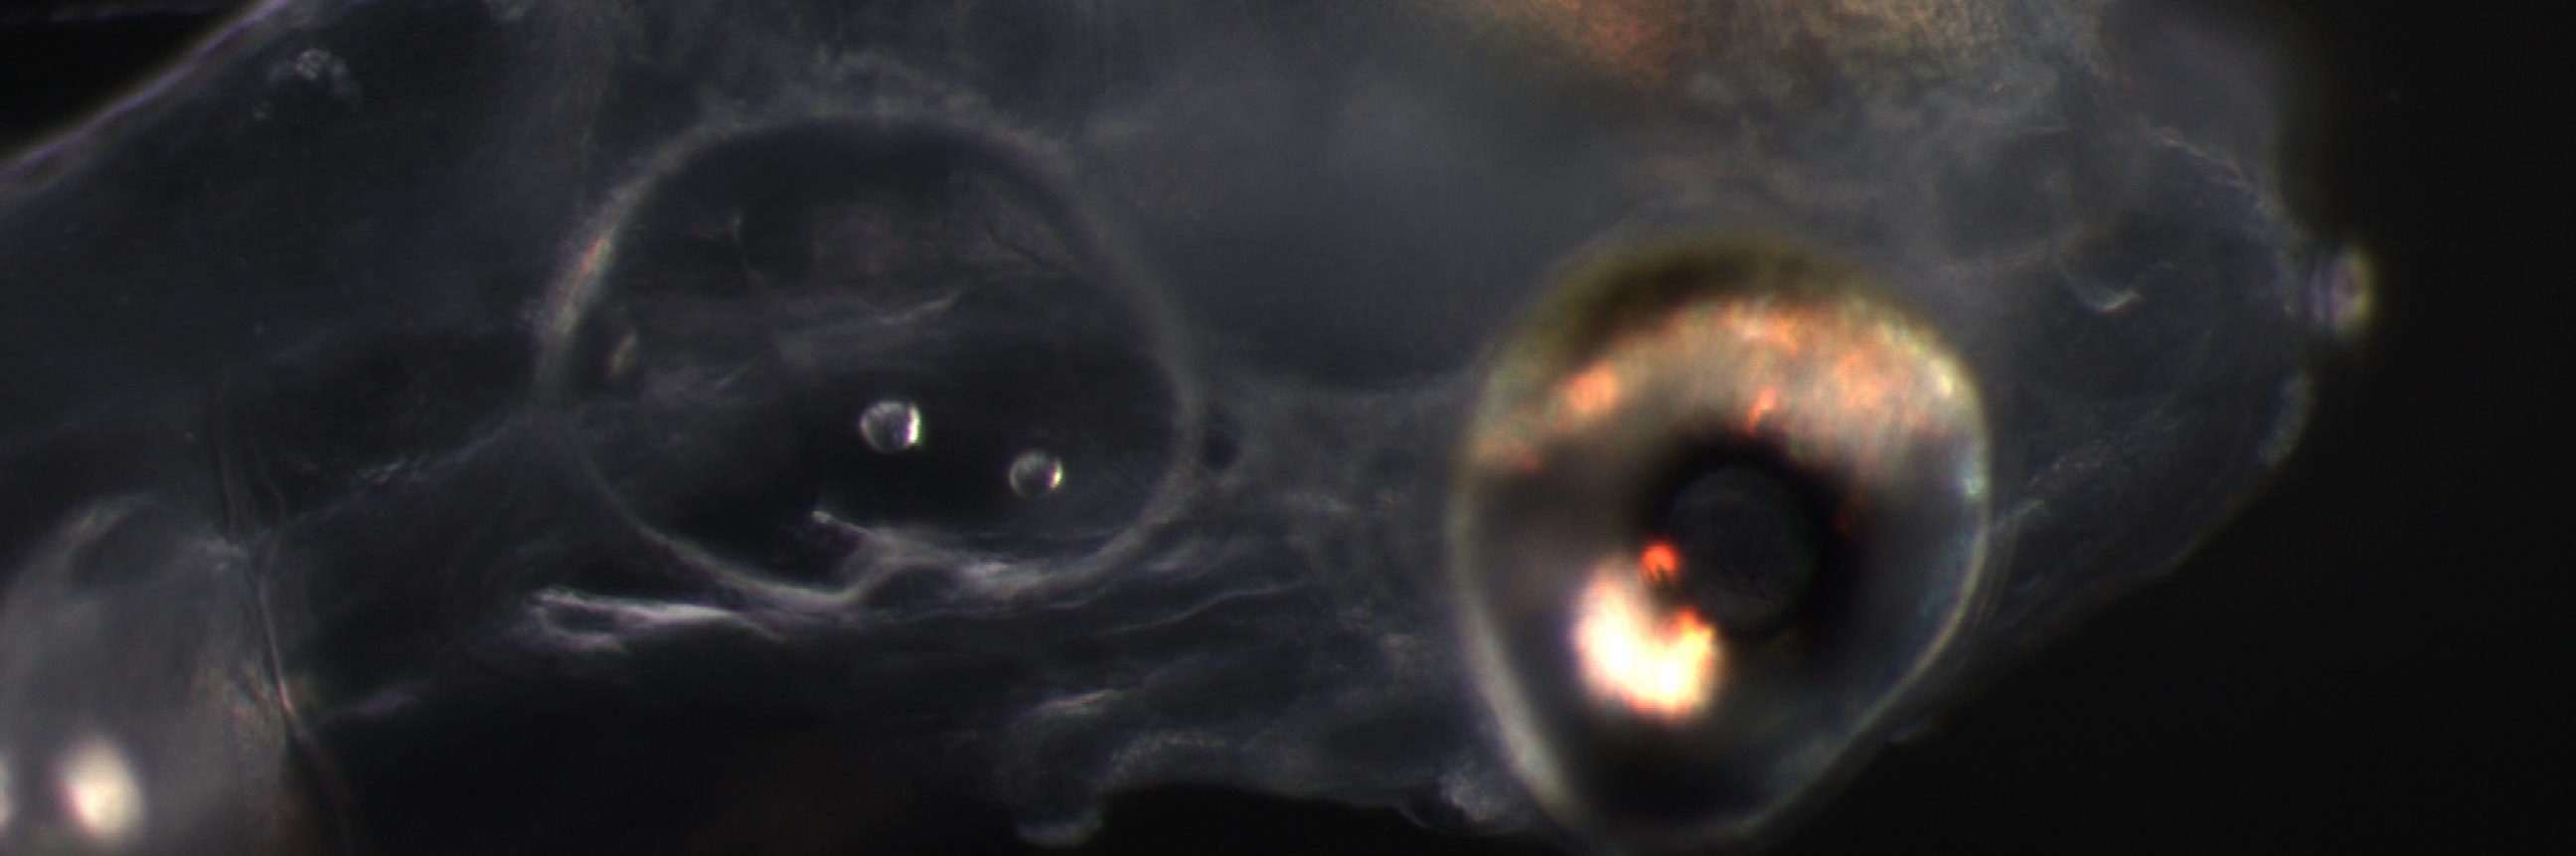 1 dph larva head + otolith